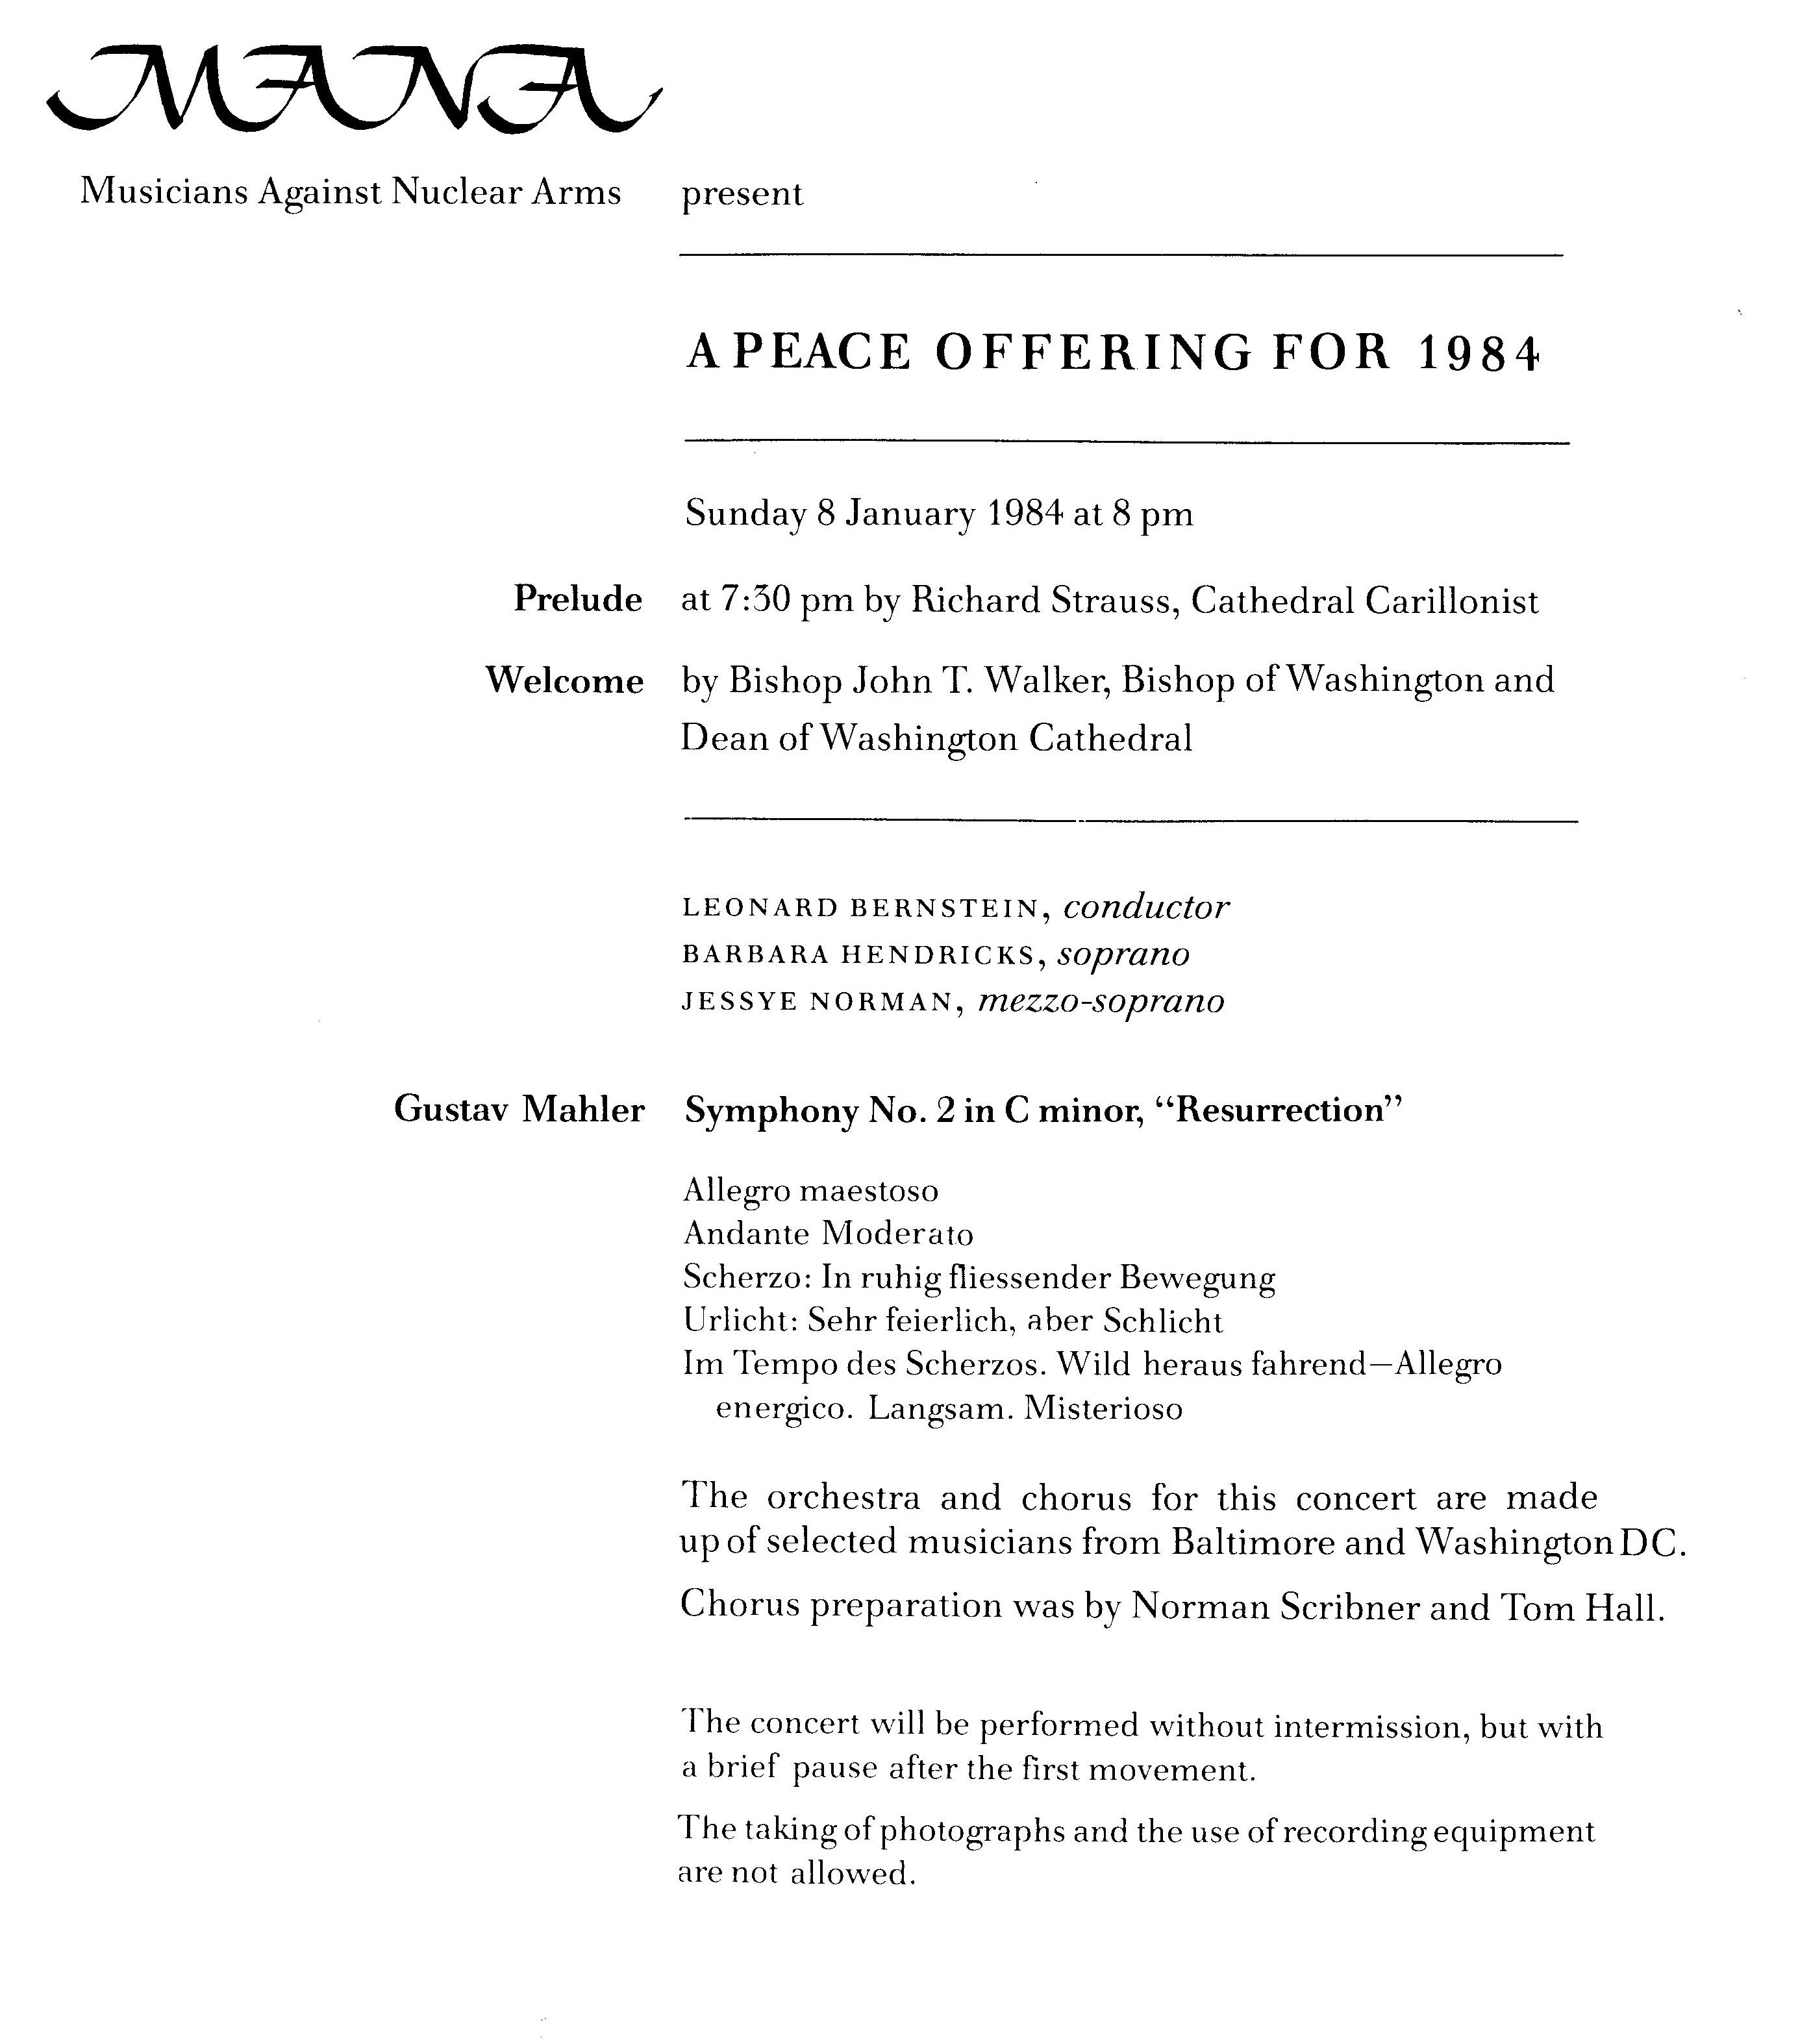 Bernstein_MANA_concert_CD_1984_program